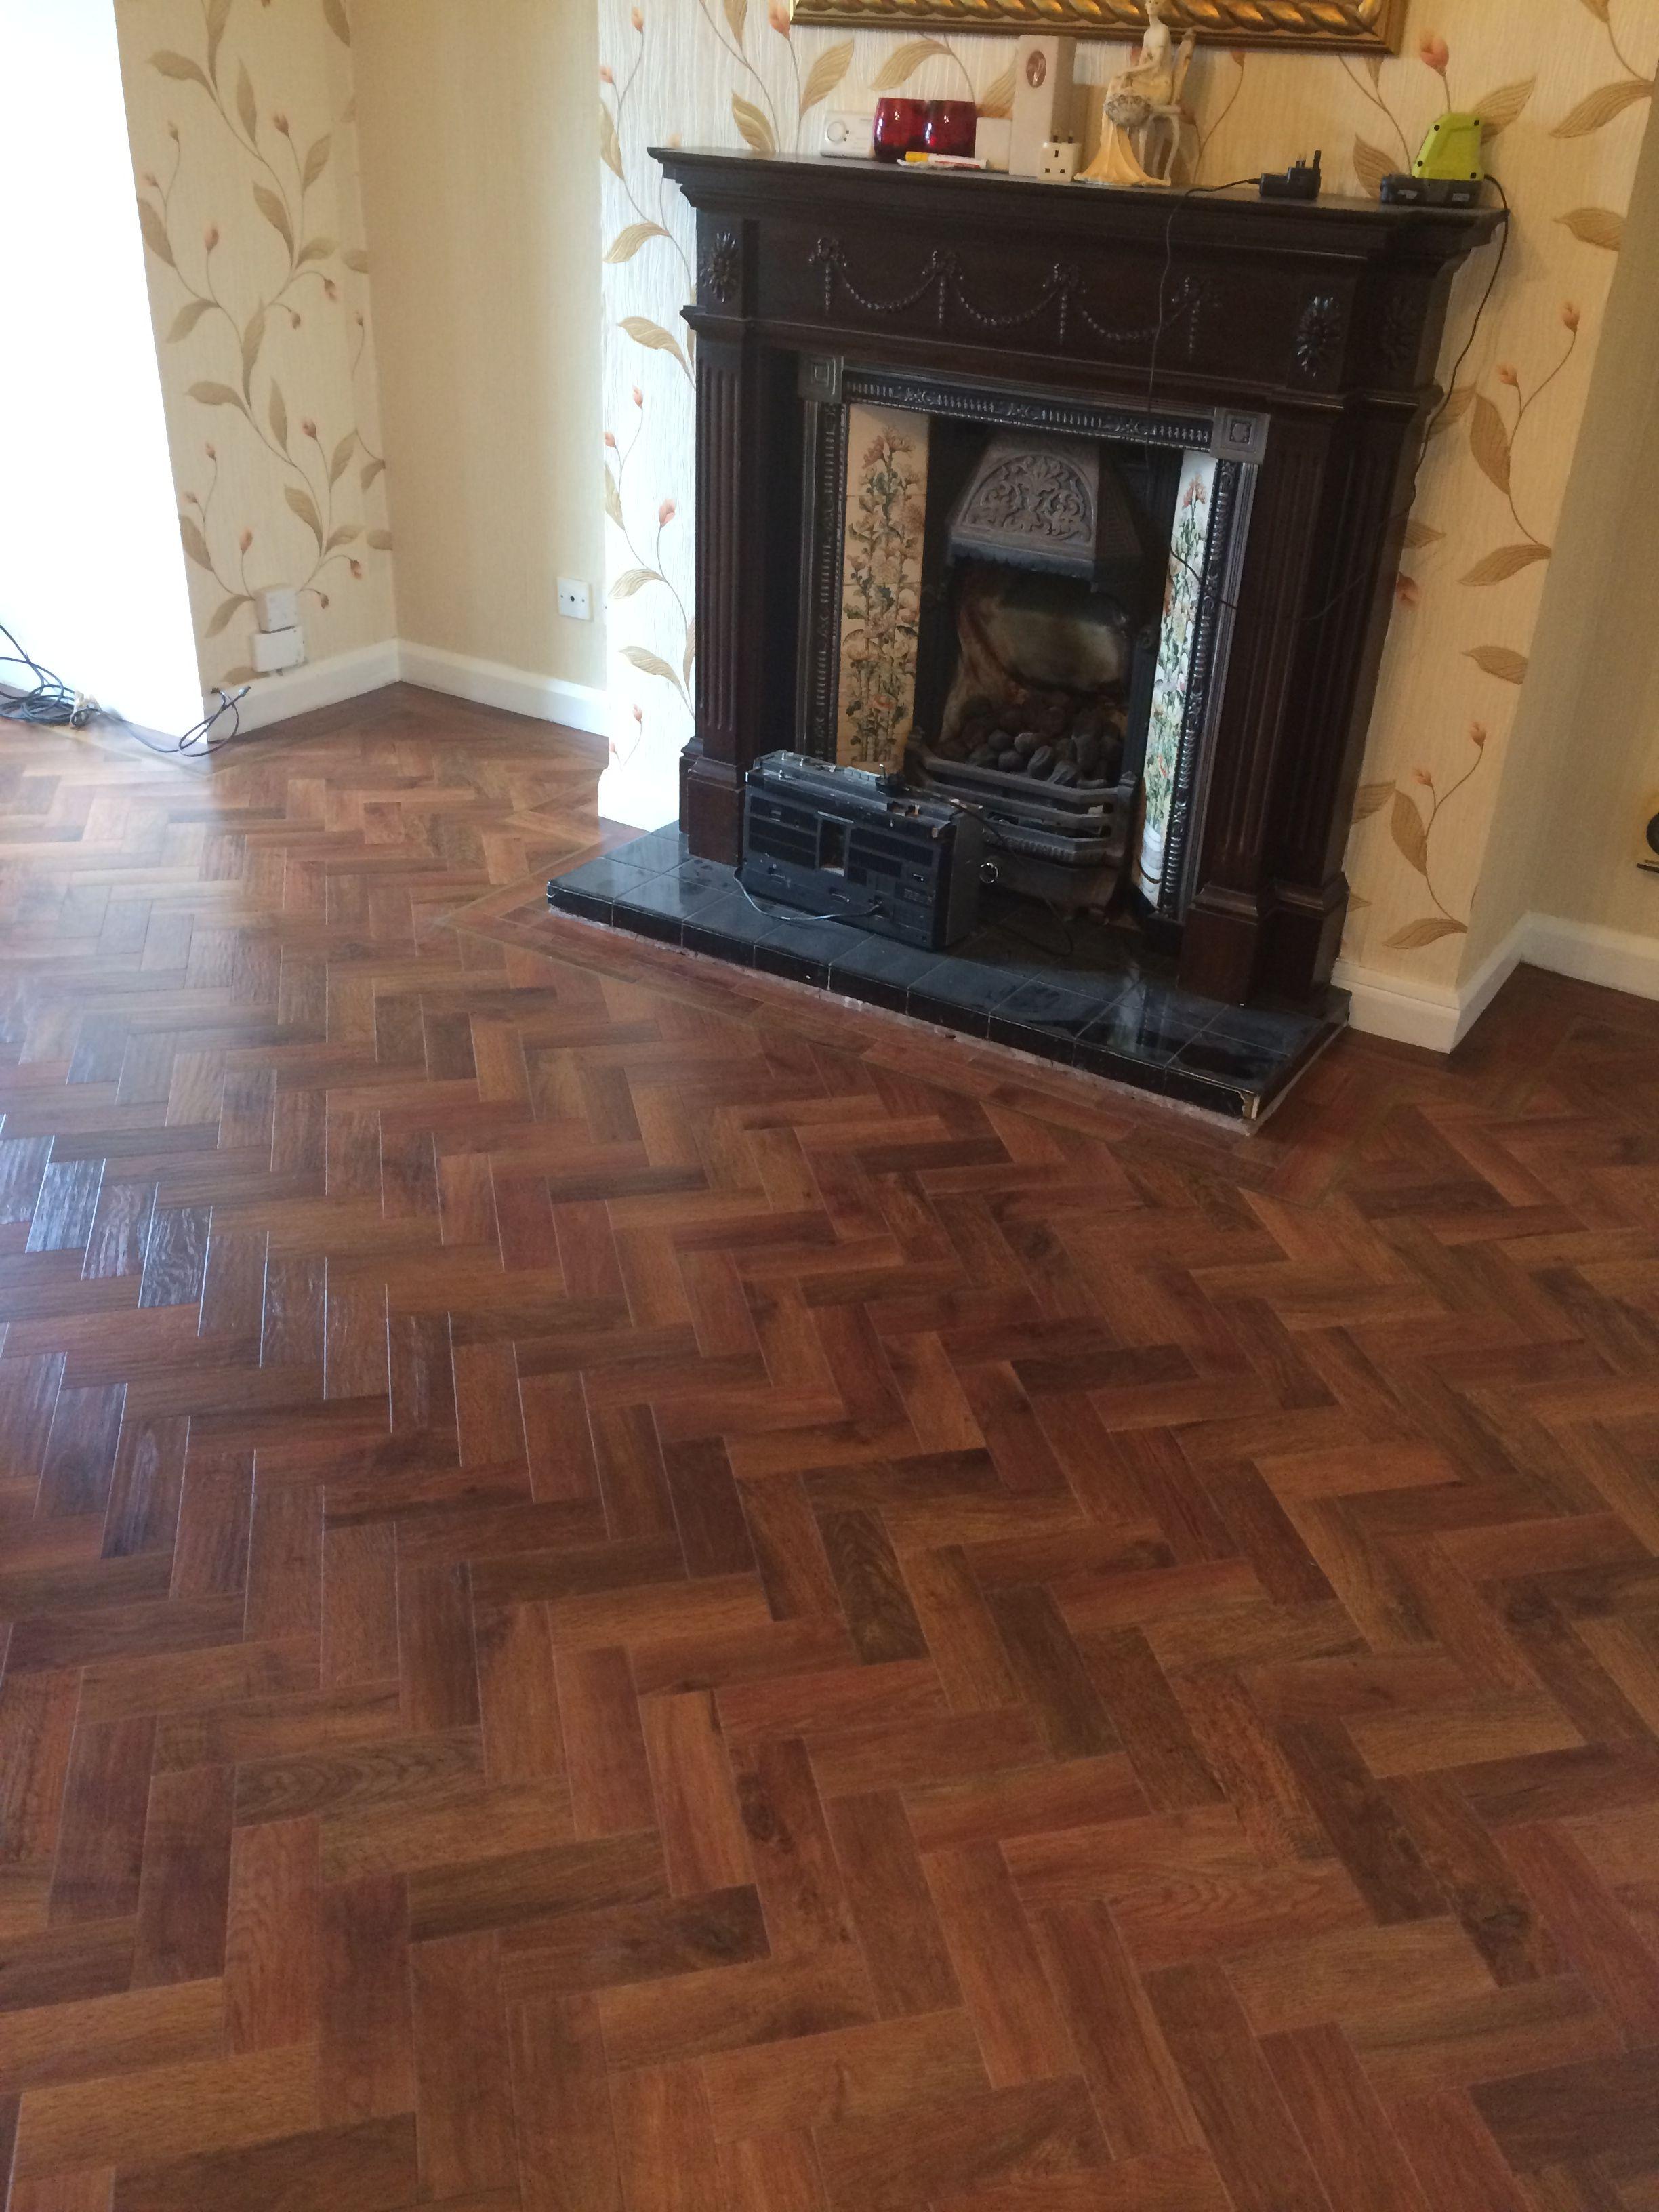 floor flooring waterfront karndean hotel floors study radisson our blog blu gb case en uk commercial december